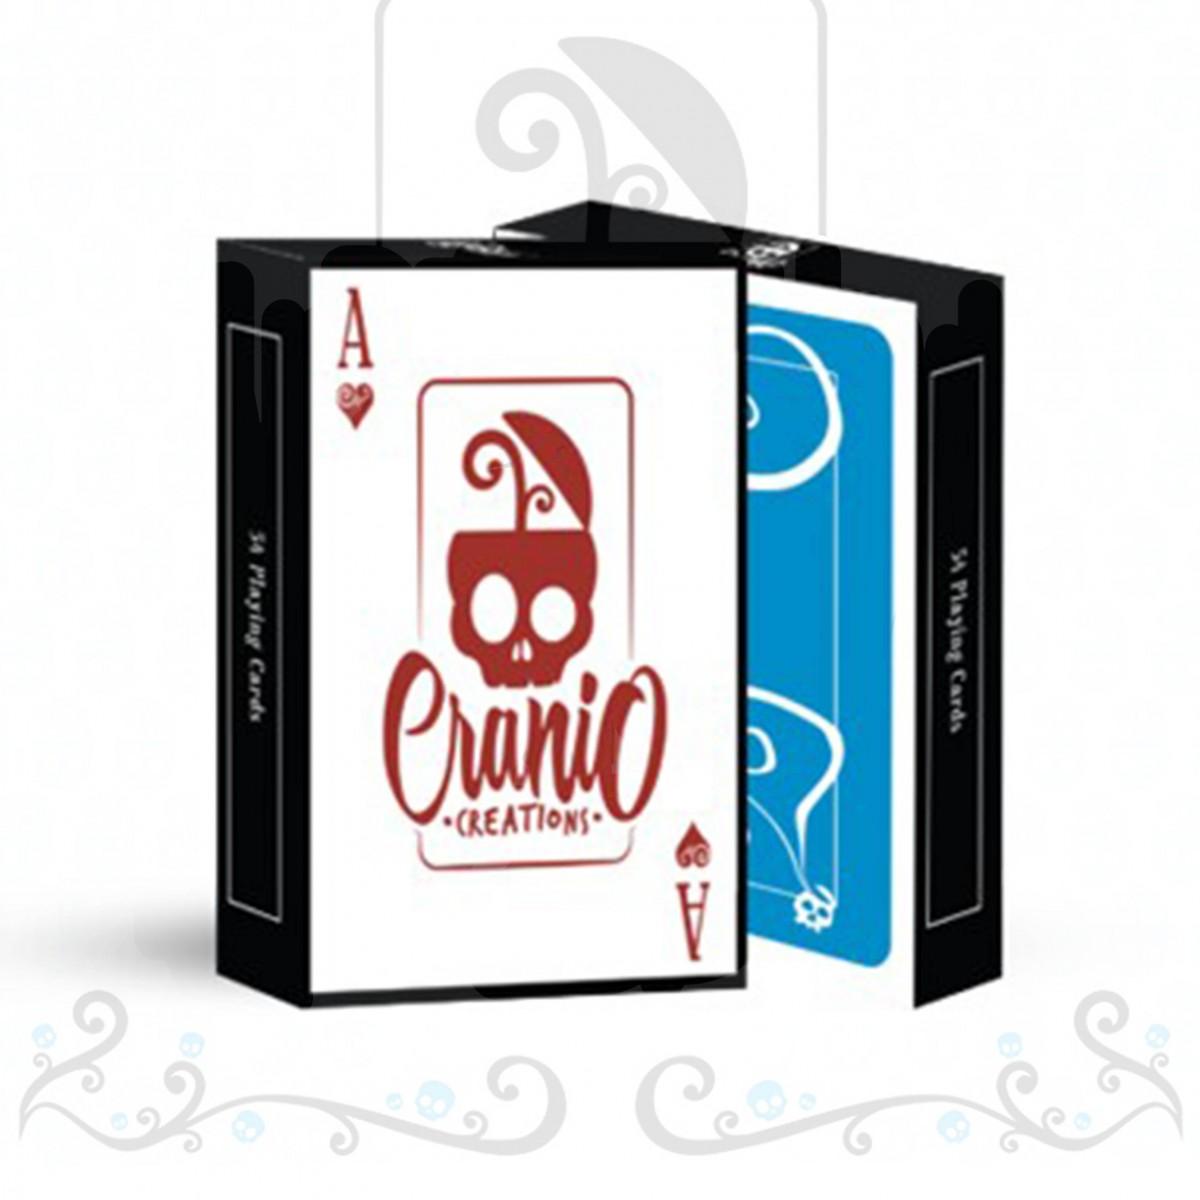 Cranio creations poker blue